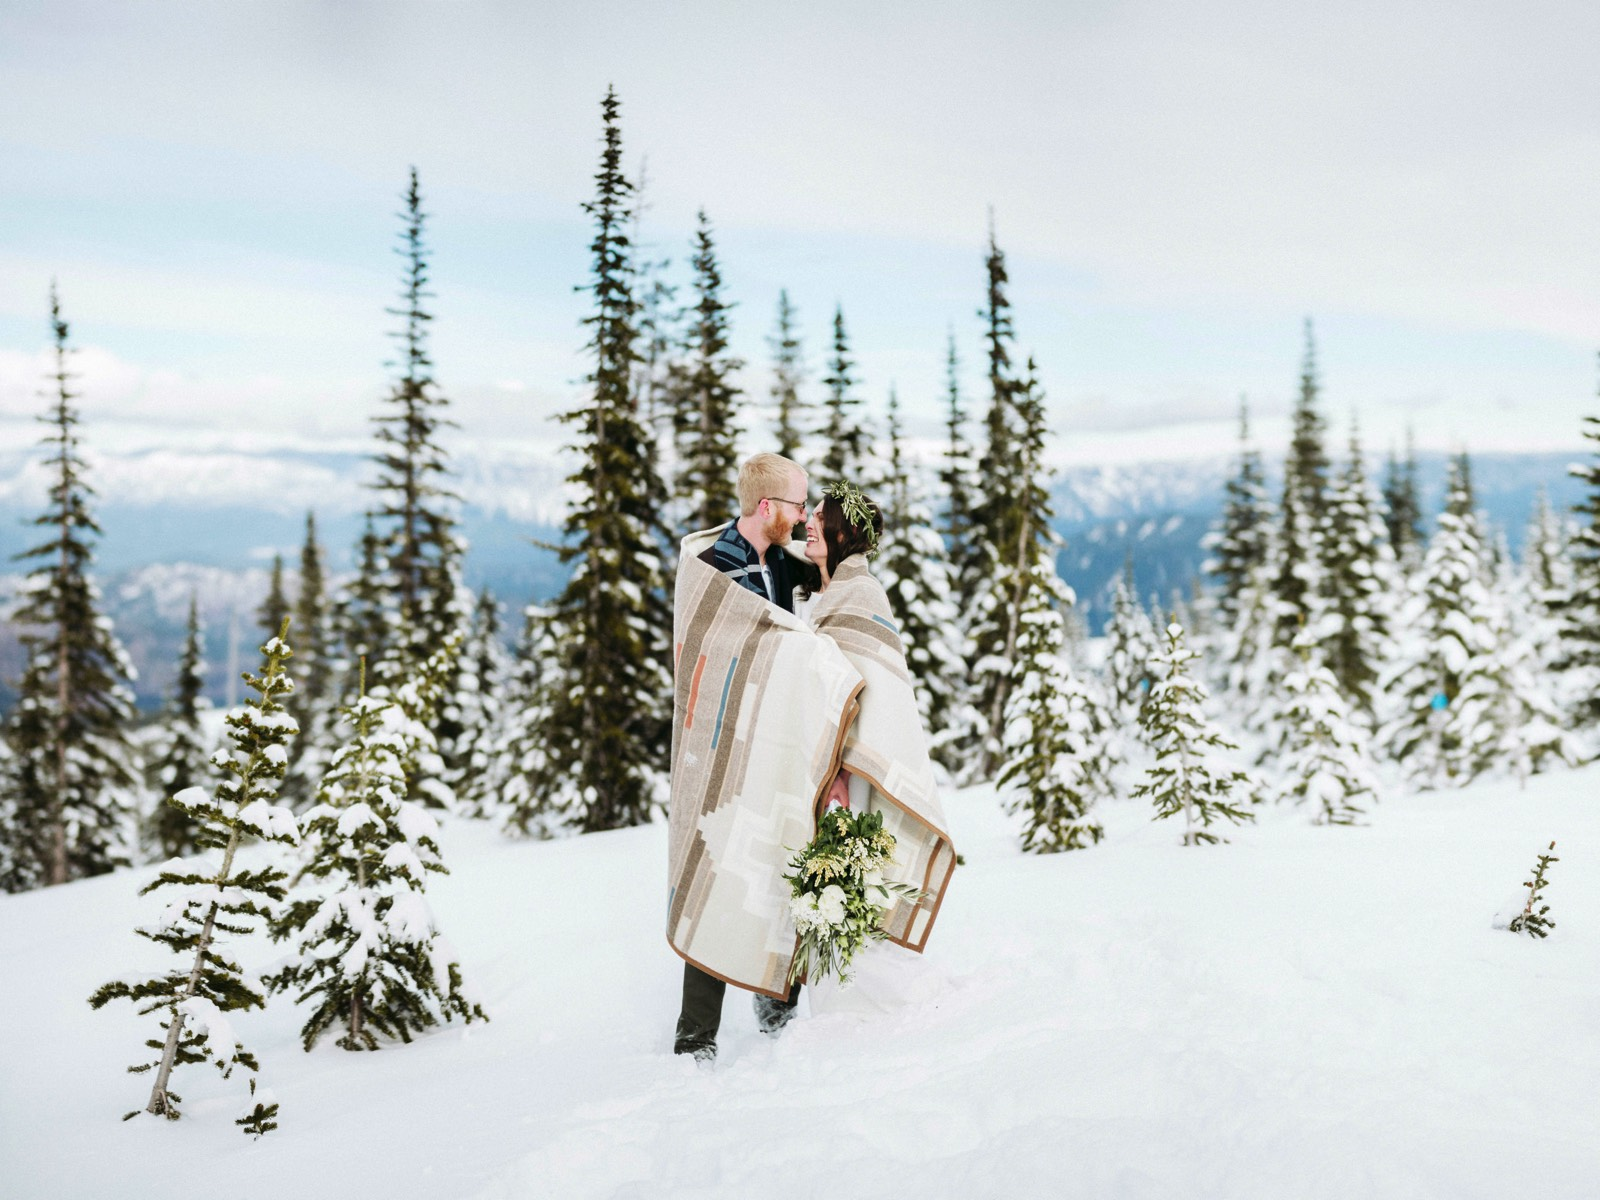 alpine-lakes-high-camp-winter-wedding-60 ALPINE LAKES HIGH CAMP WEDDING